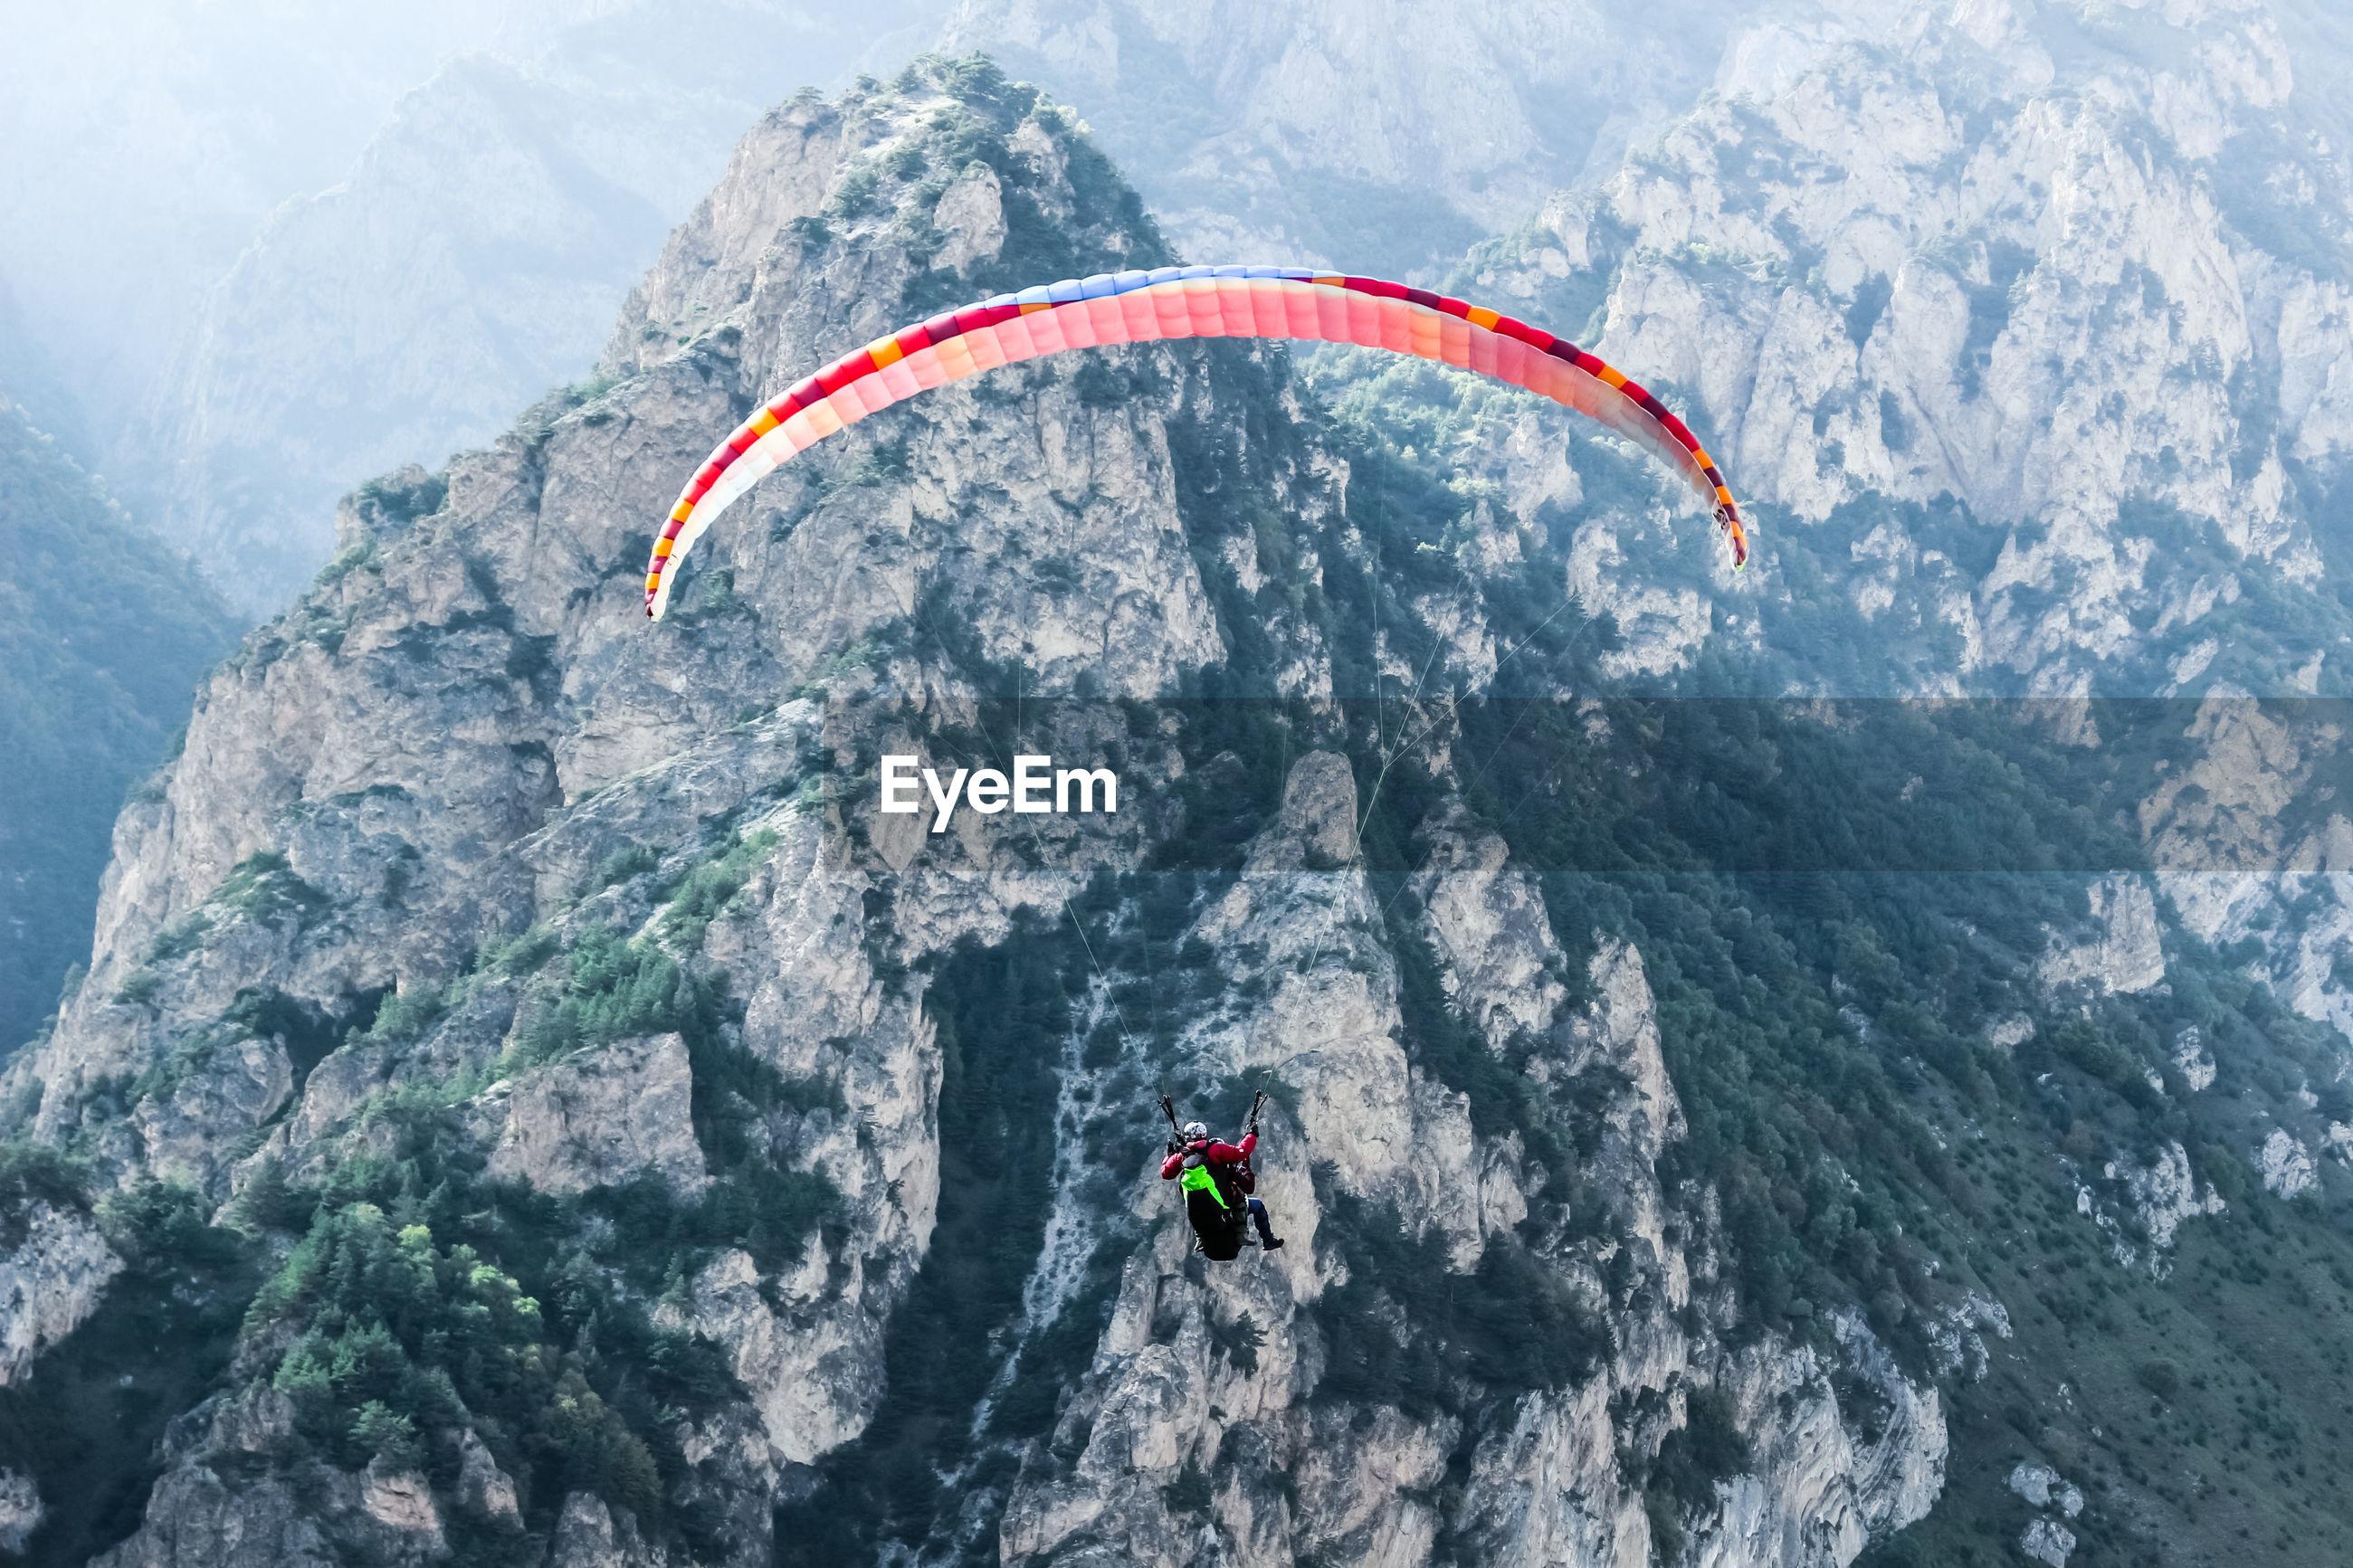 People paragliding on mountain peak